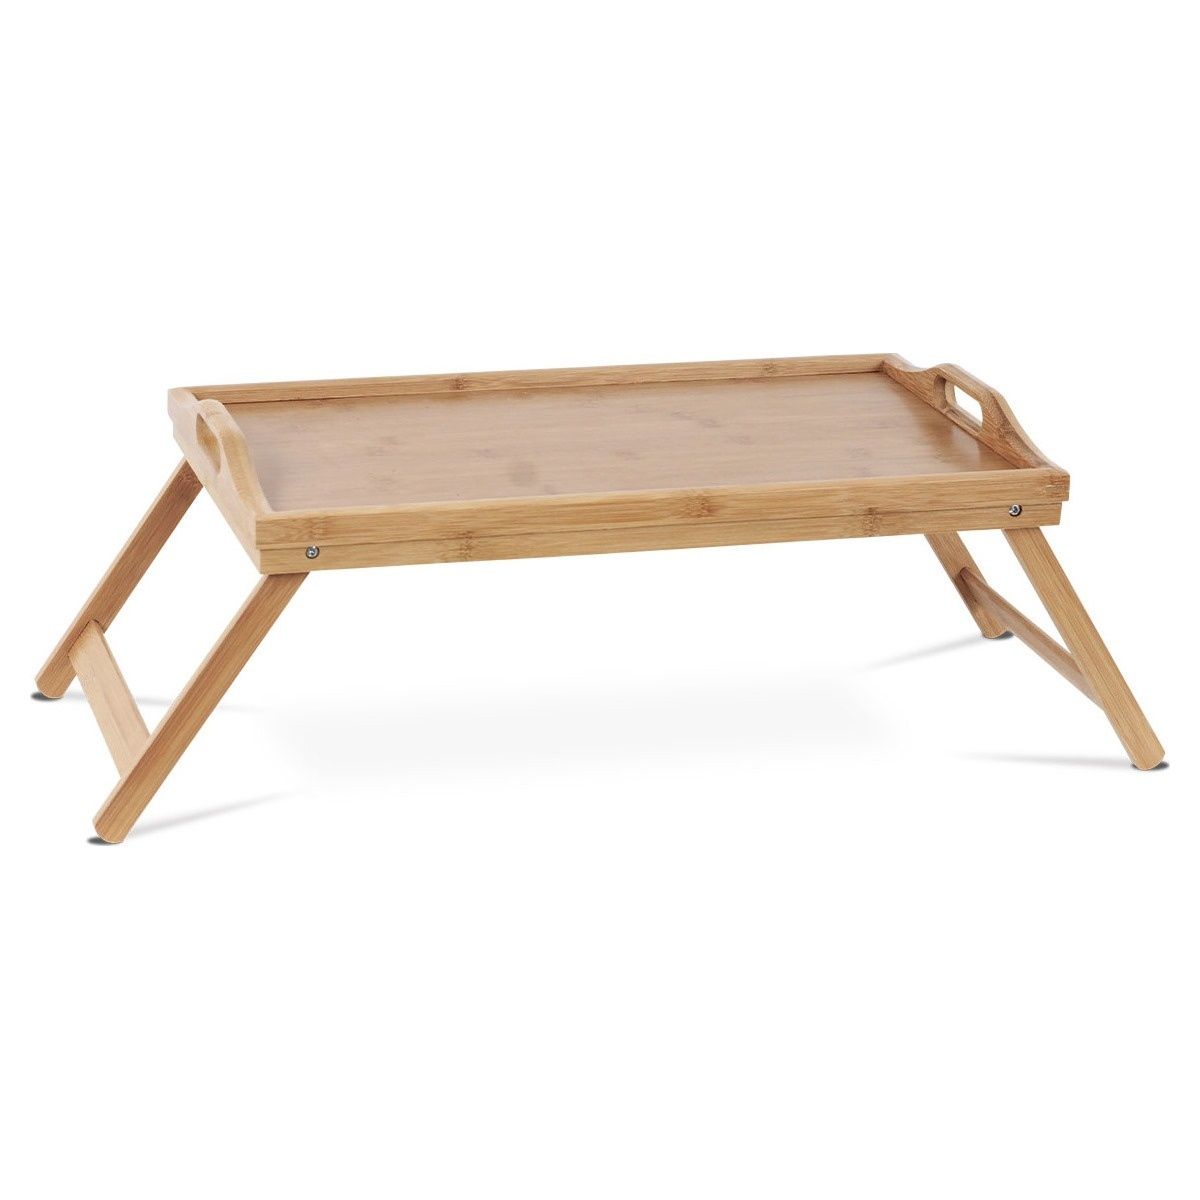 Bambusový podnos do postele, 50 x 30 x 22 cm